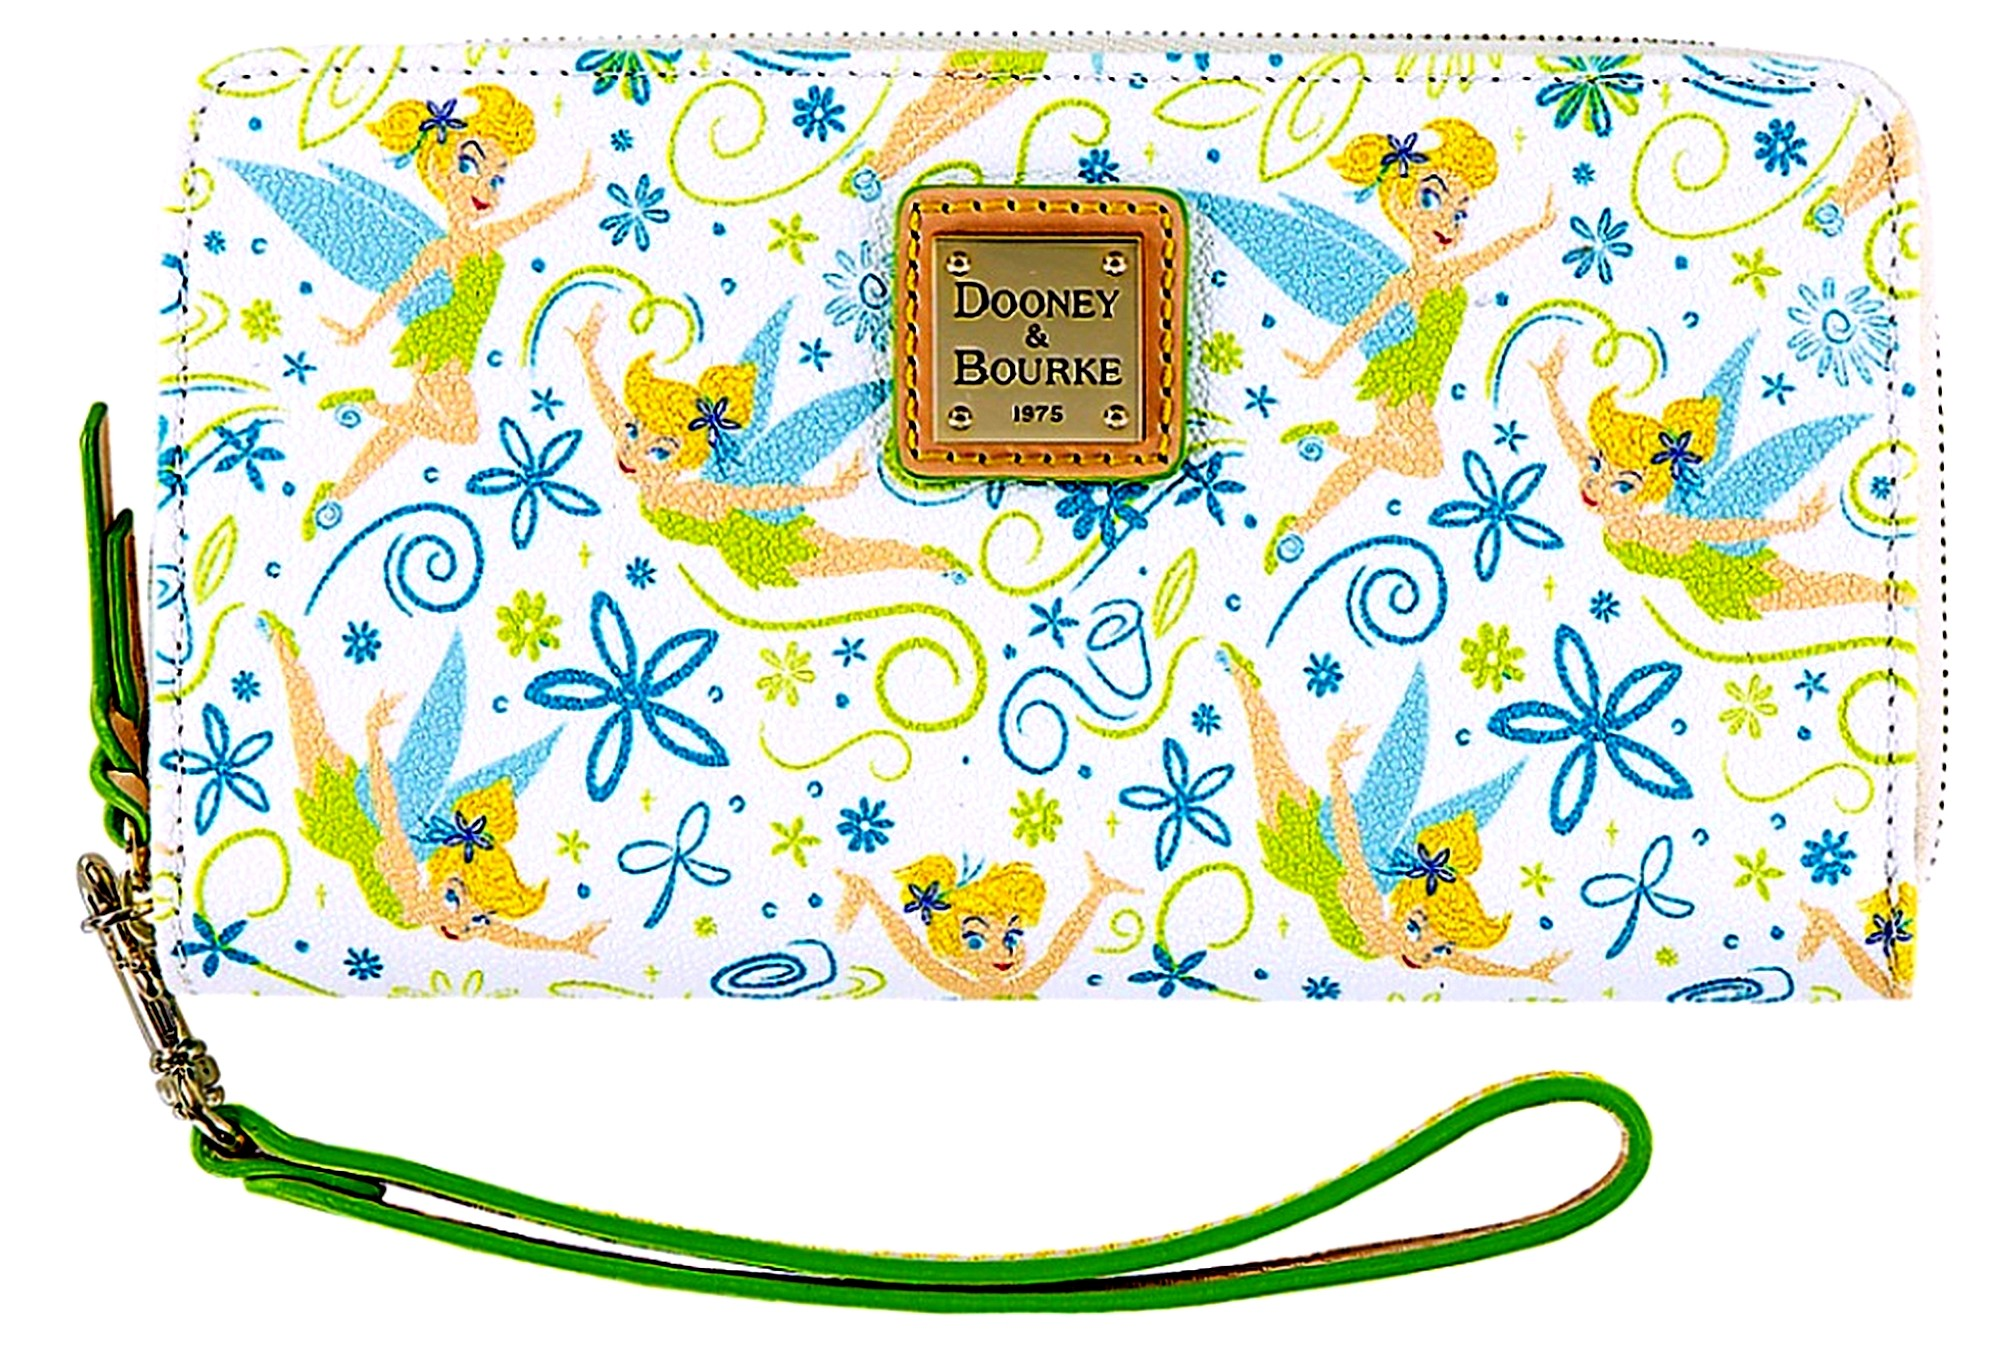 Dooney & Bourke Tinker Bell Floral Large Wallet With Phone Pocket - Disney World Exclusive © Dizdude.com